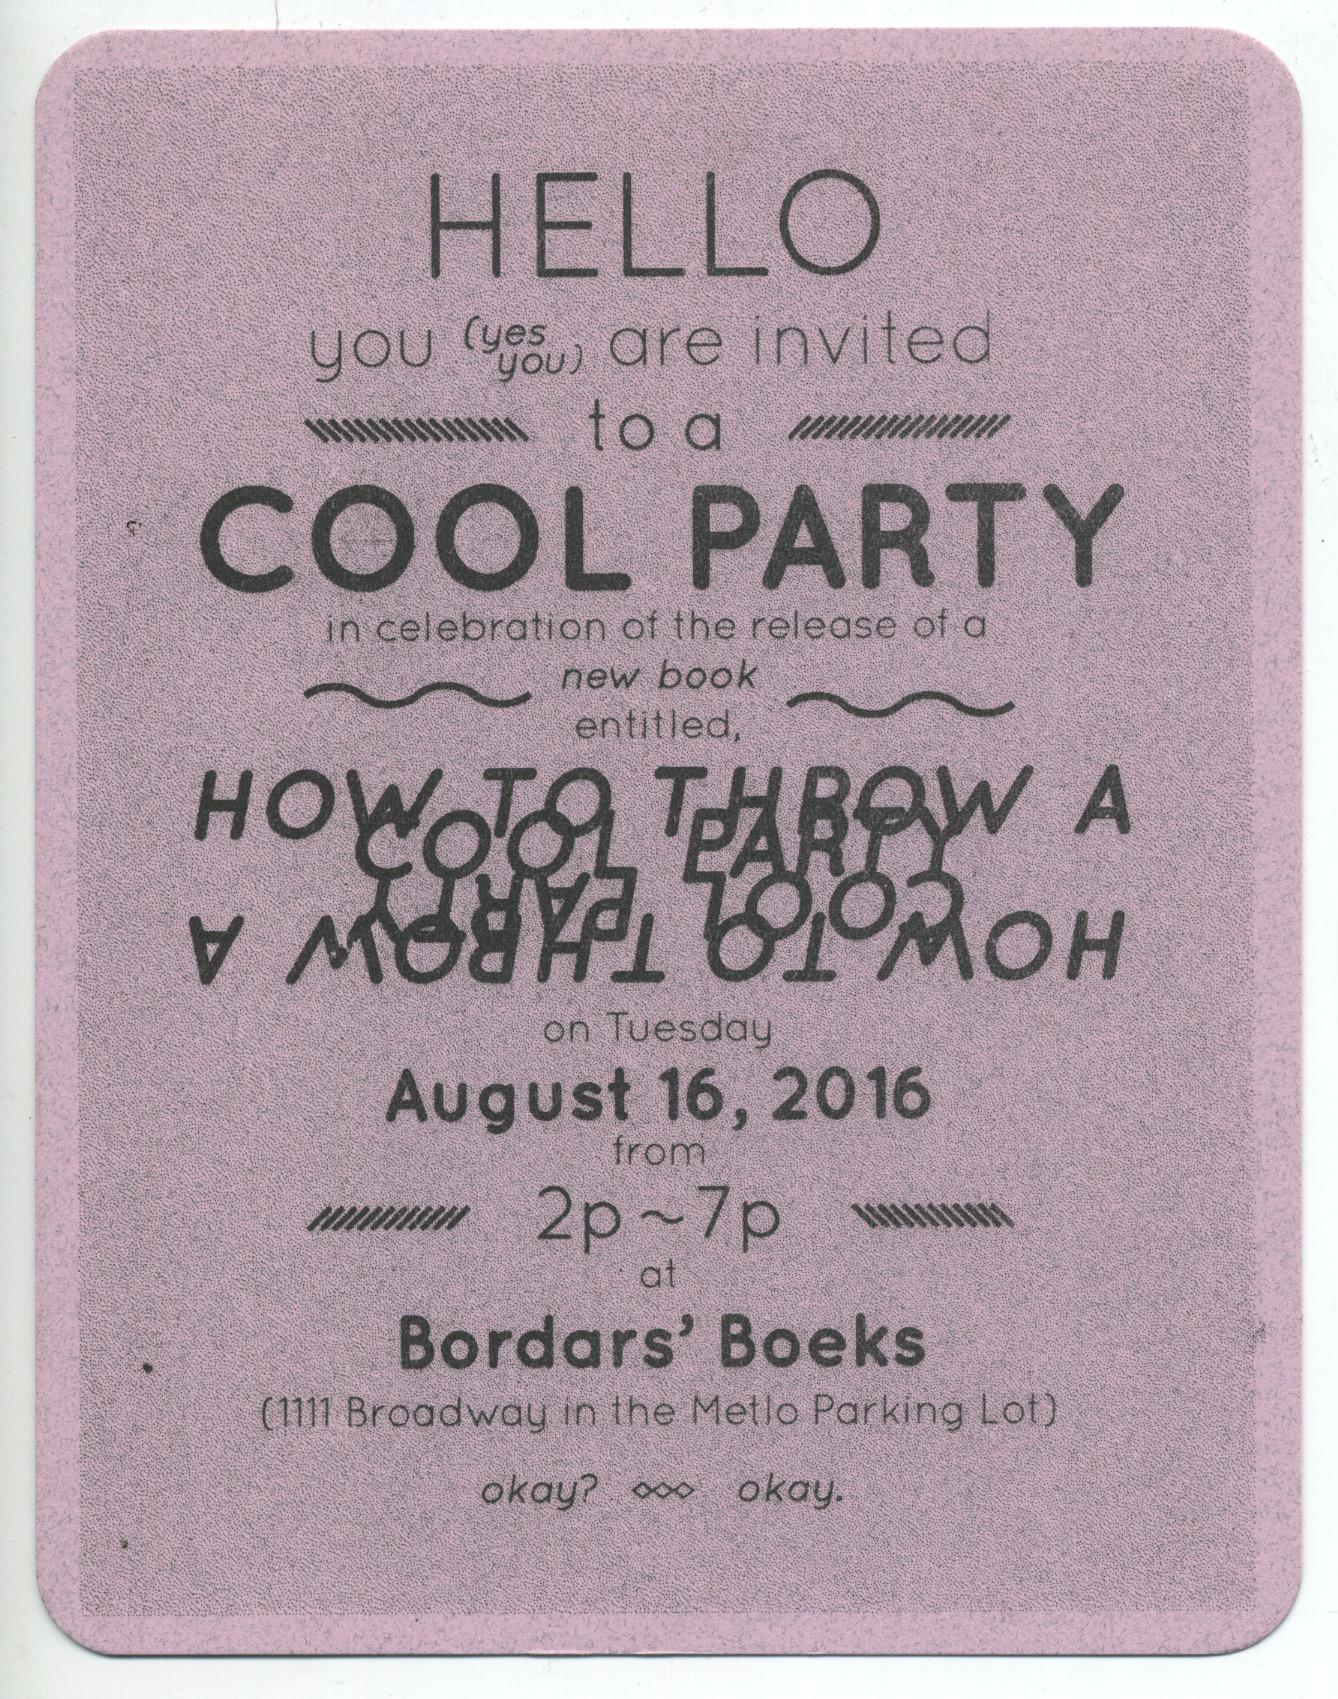 Cool Party Flier.jpeg